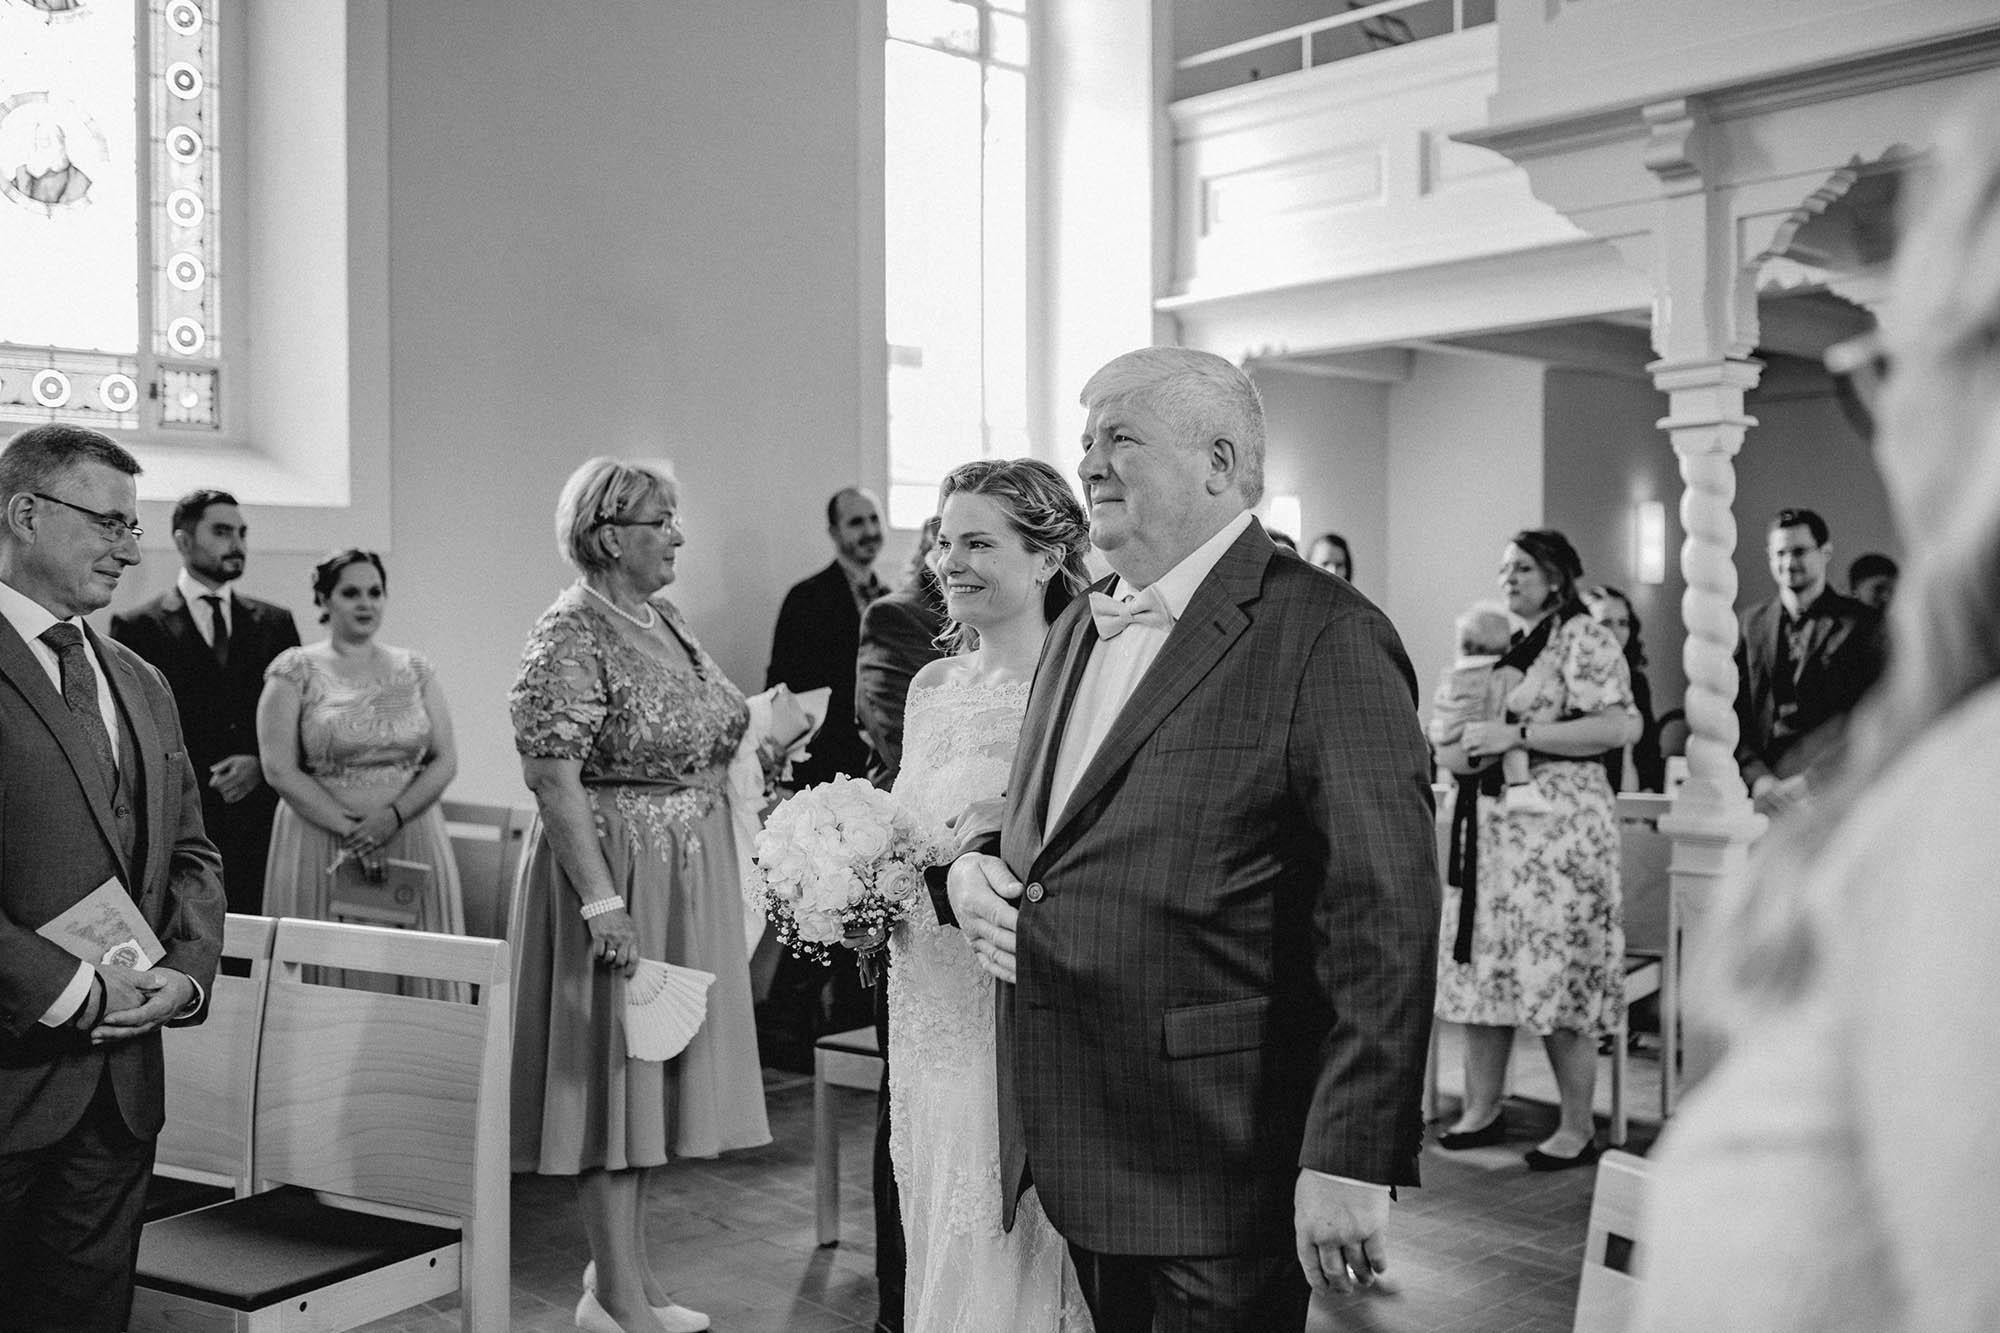 Virginia-Pech-Fotografie-Hochzeitsfotograf-Hochzeitsfotografie-Kulturscheune-Rangsdorf-Berlin-Anika-Nico-29